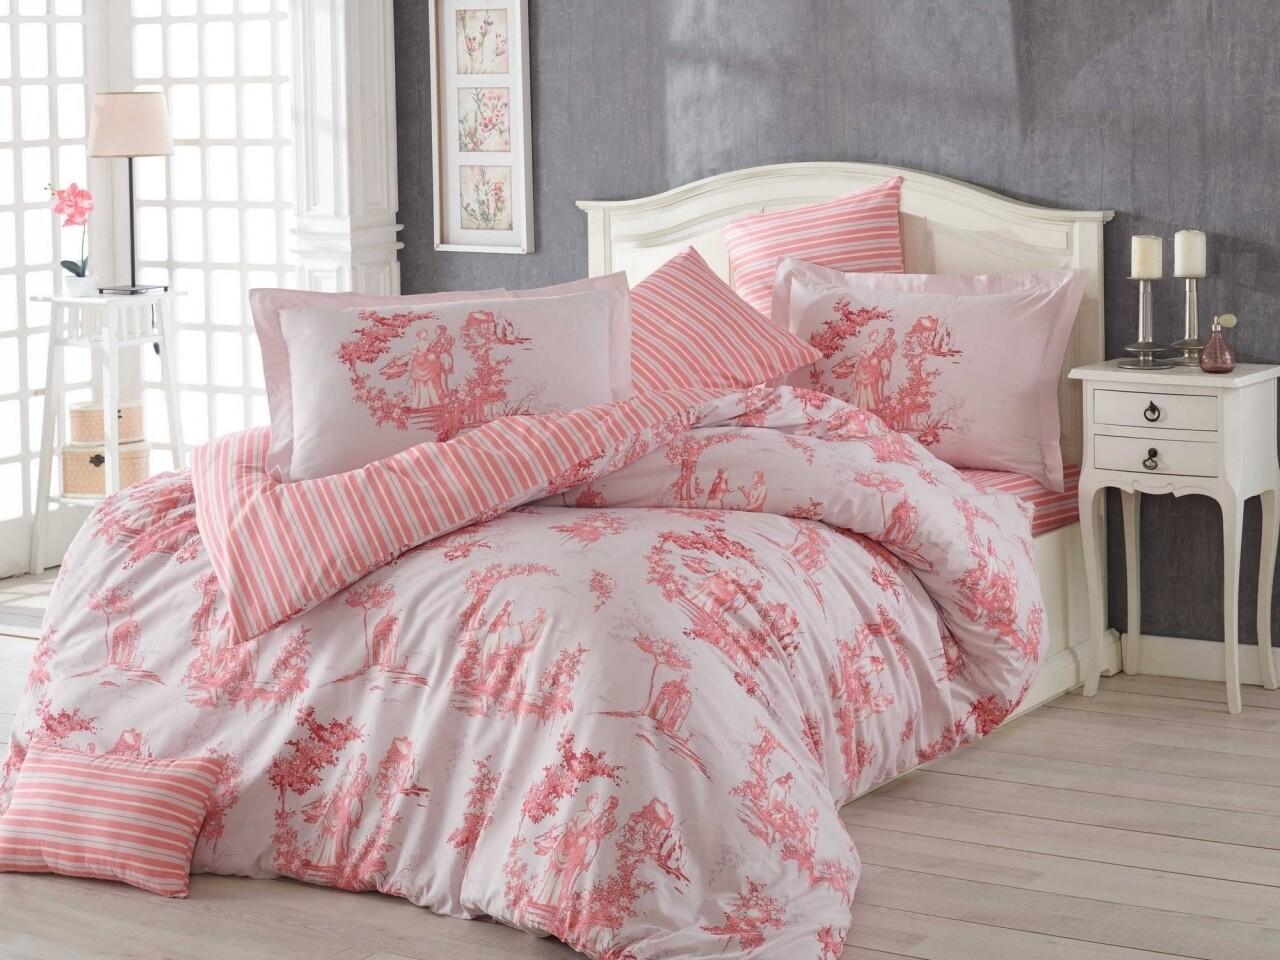 Lenjerie de pat pentru o persoana, 3 piese, 100% bumbac poplin, Hobby, Vanessa, roz